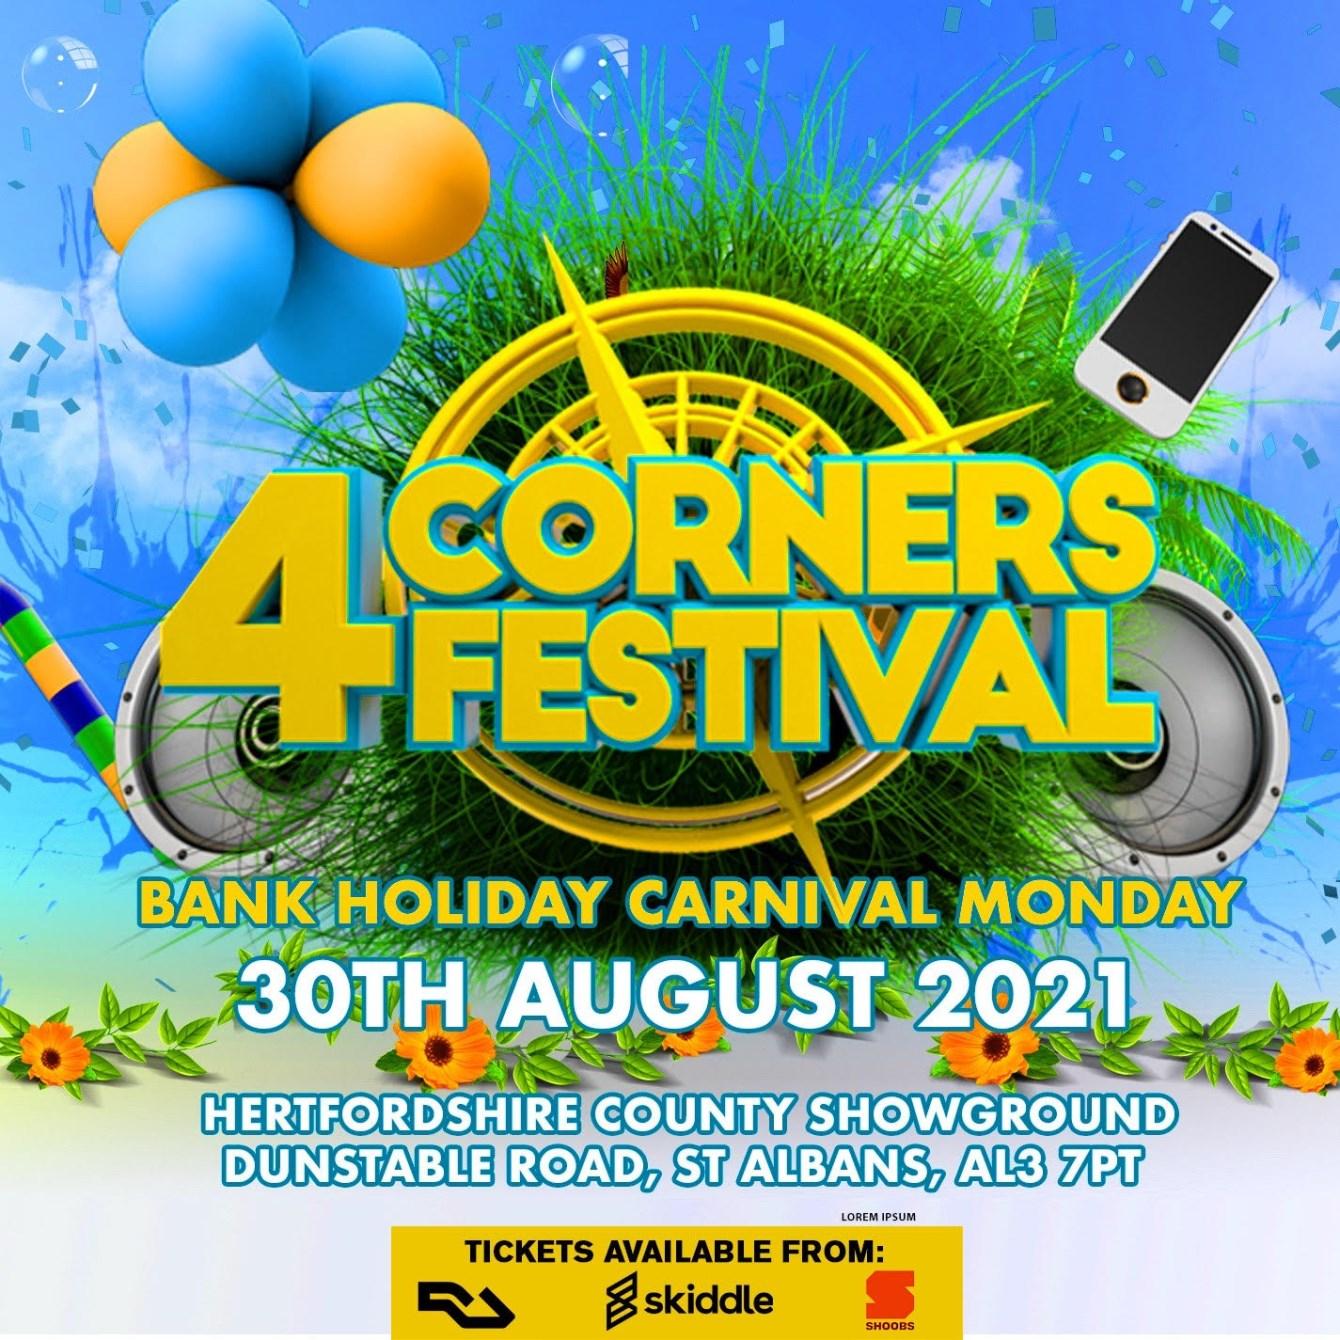 4corners Festival - Flyer front